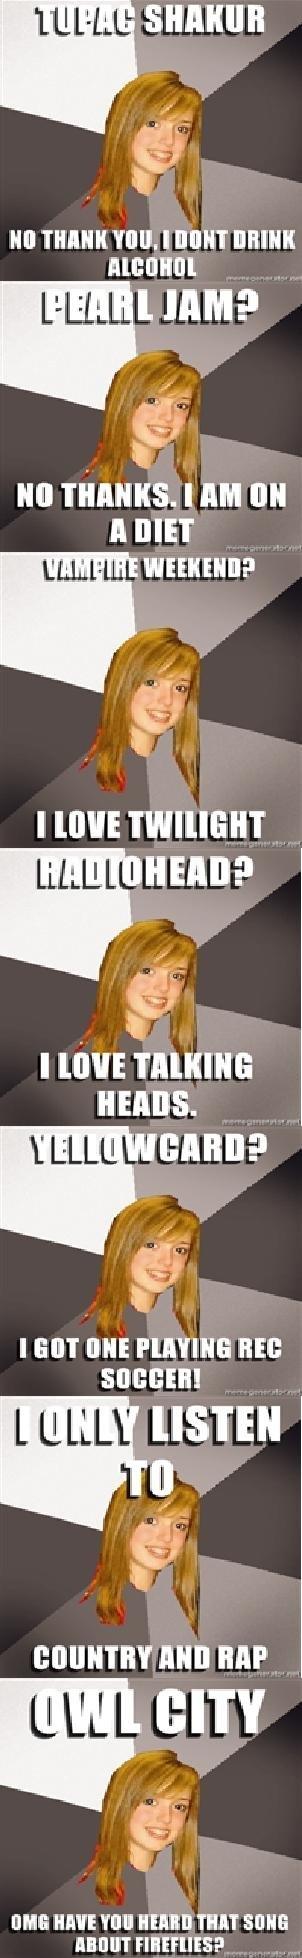 "Musically Oblivious 8th Grader 2. I take no credit.. M ' HIHIHI Illicit,,), Enma- wanna? lls' |' Eli MII link . HAIR hatt TE!"" TEN MM. i LOVE yellowcard! and i love these, keep it up. musically oblivious eighth grader twilight vampier owl City fireflies radiohead Head"